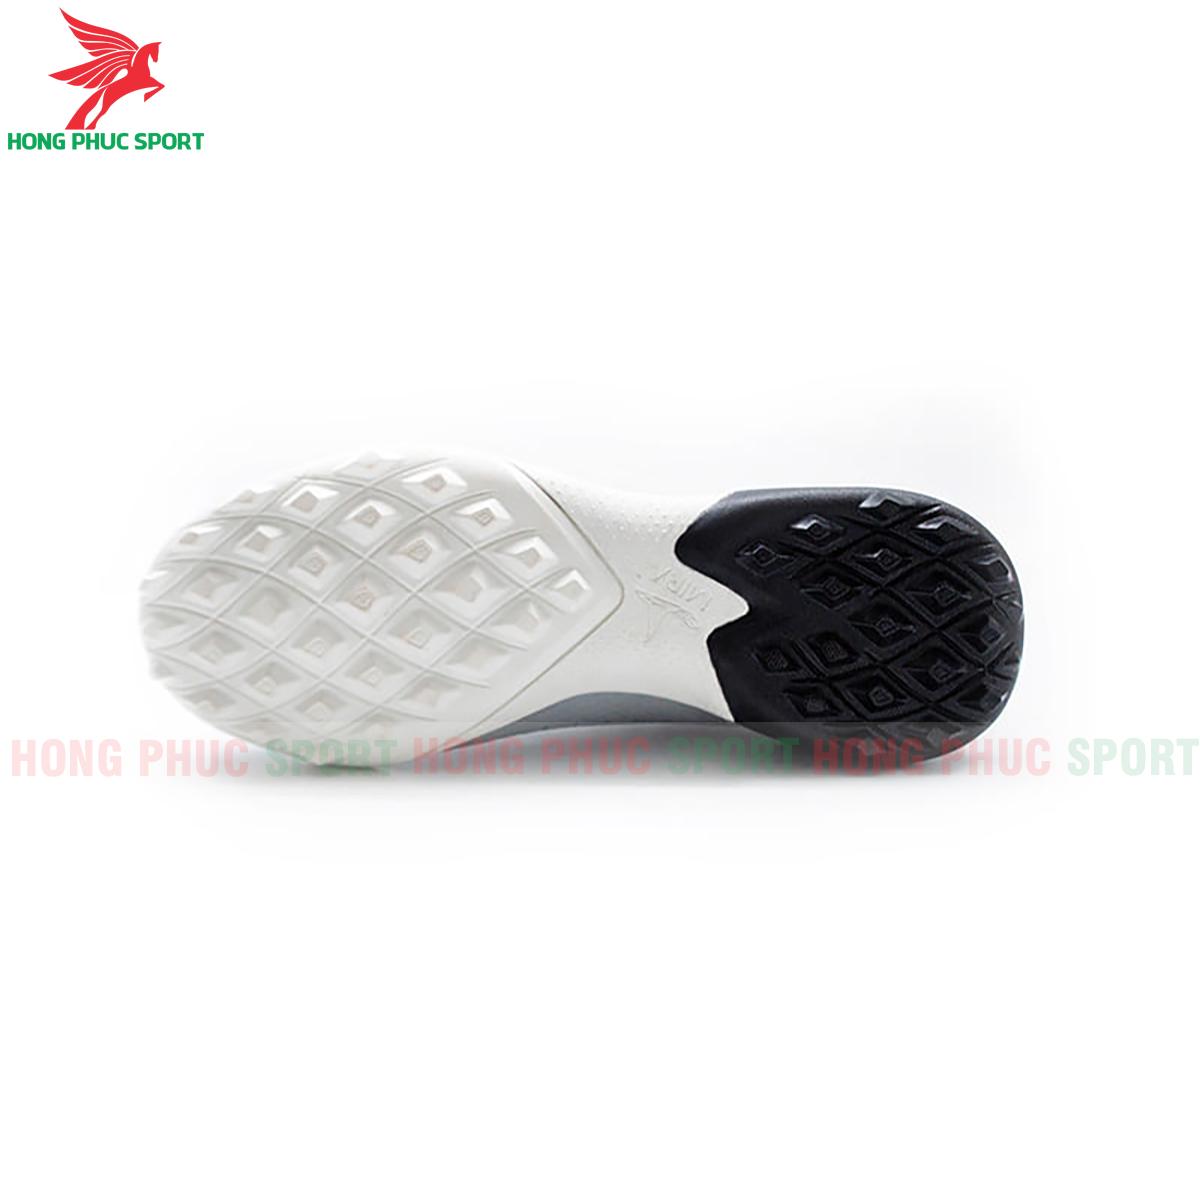 https://cdn.hongphucsport.com/unsafe/s4.shopbay.vn/files/285/giay-da-bong-mira-lux-20-3-mau-trang-phoi-den-7-5f74085d125fb.png